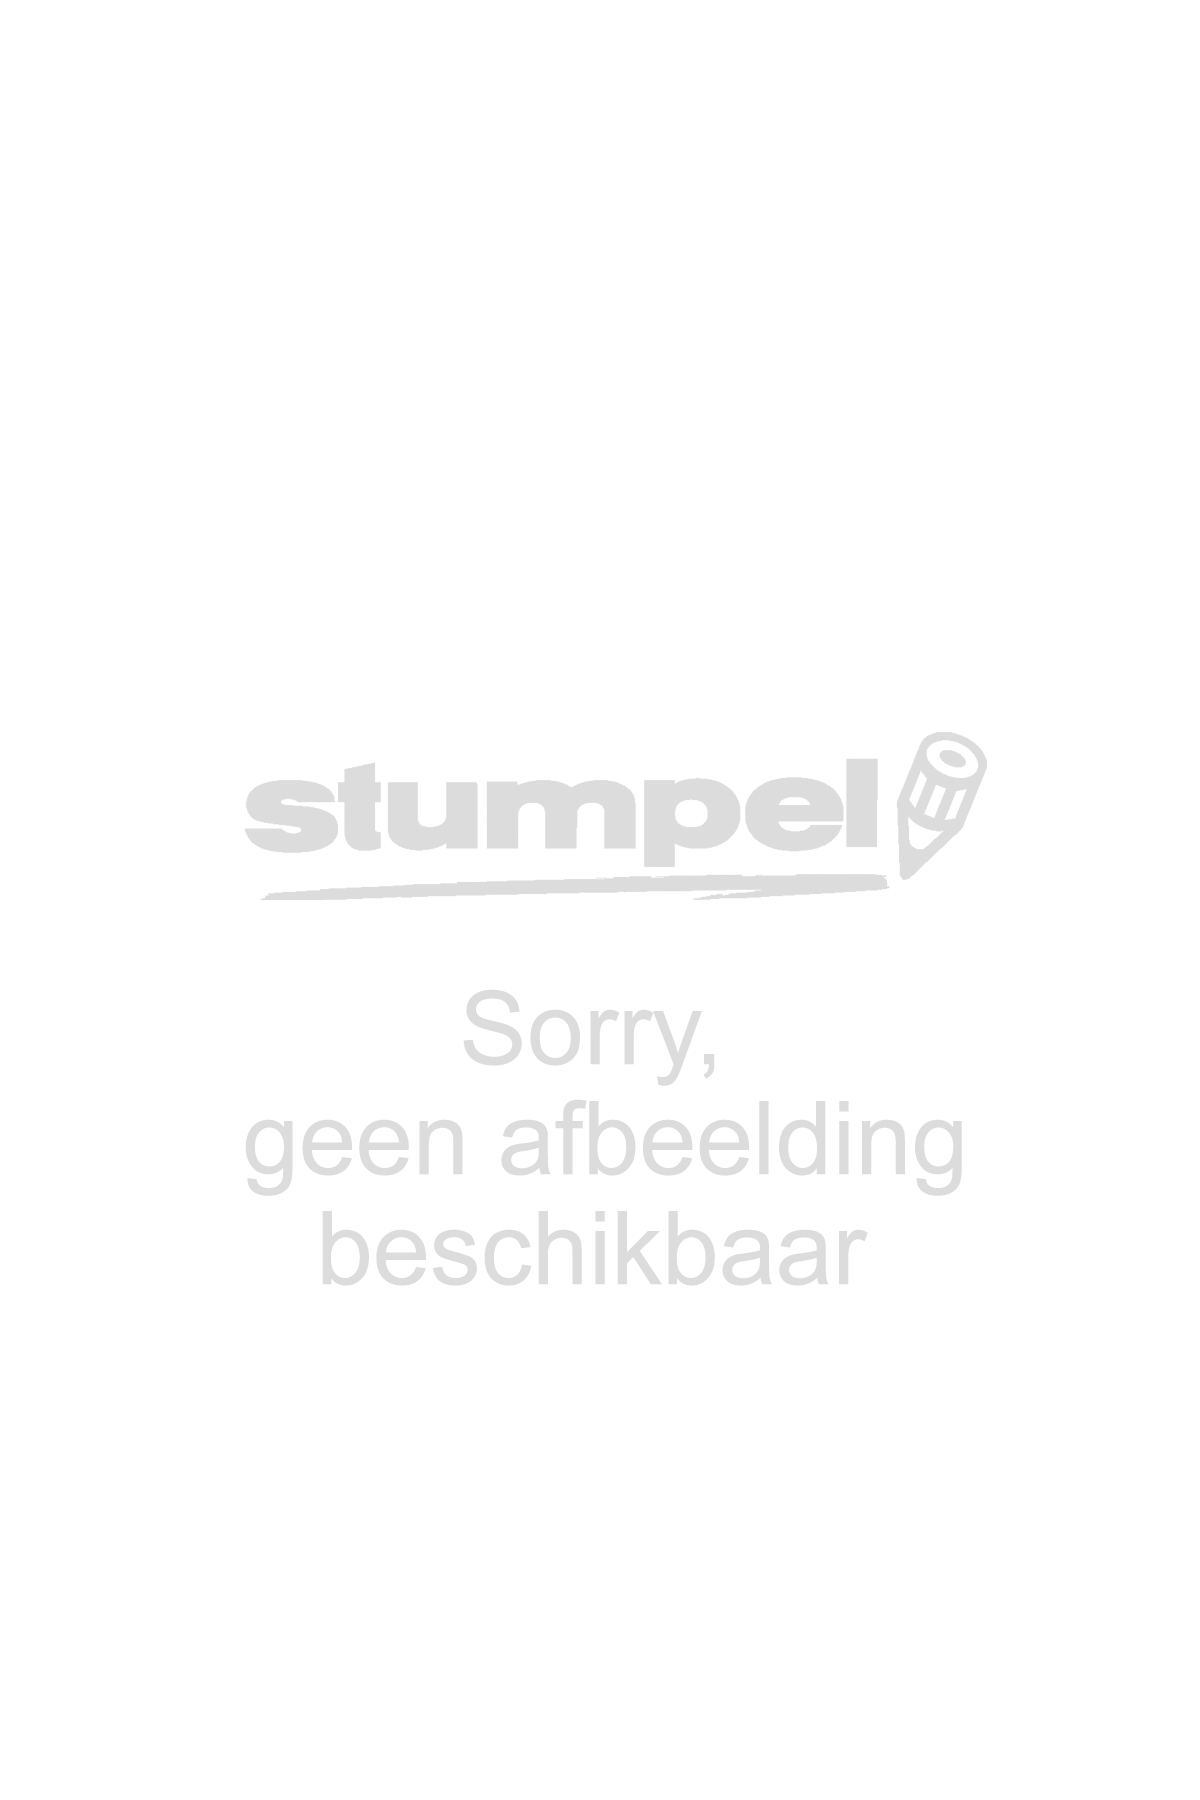 paraplu-minimax-opvouwbaar-rood-impliva-10806574